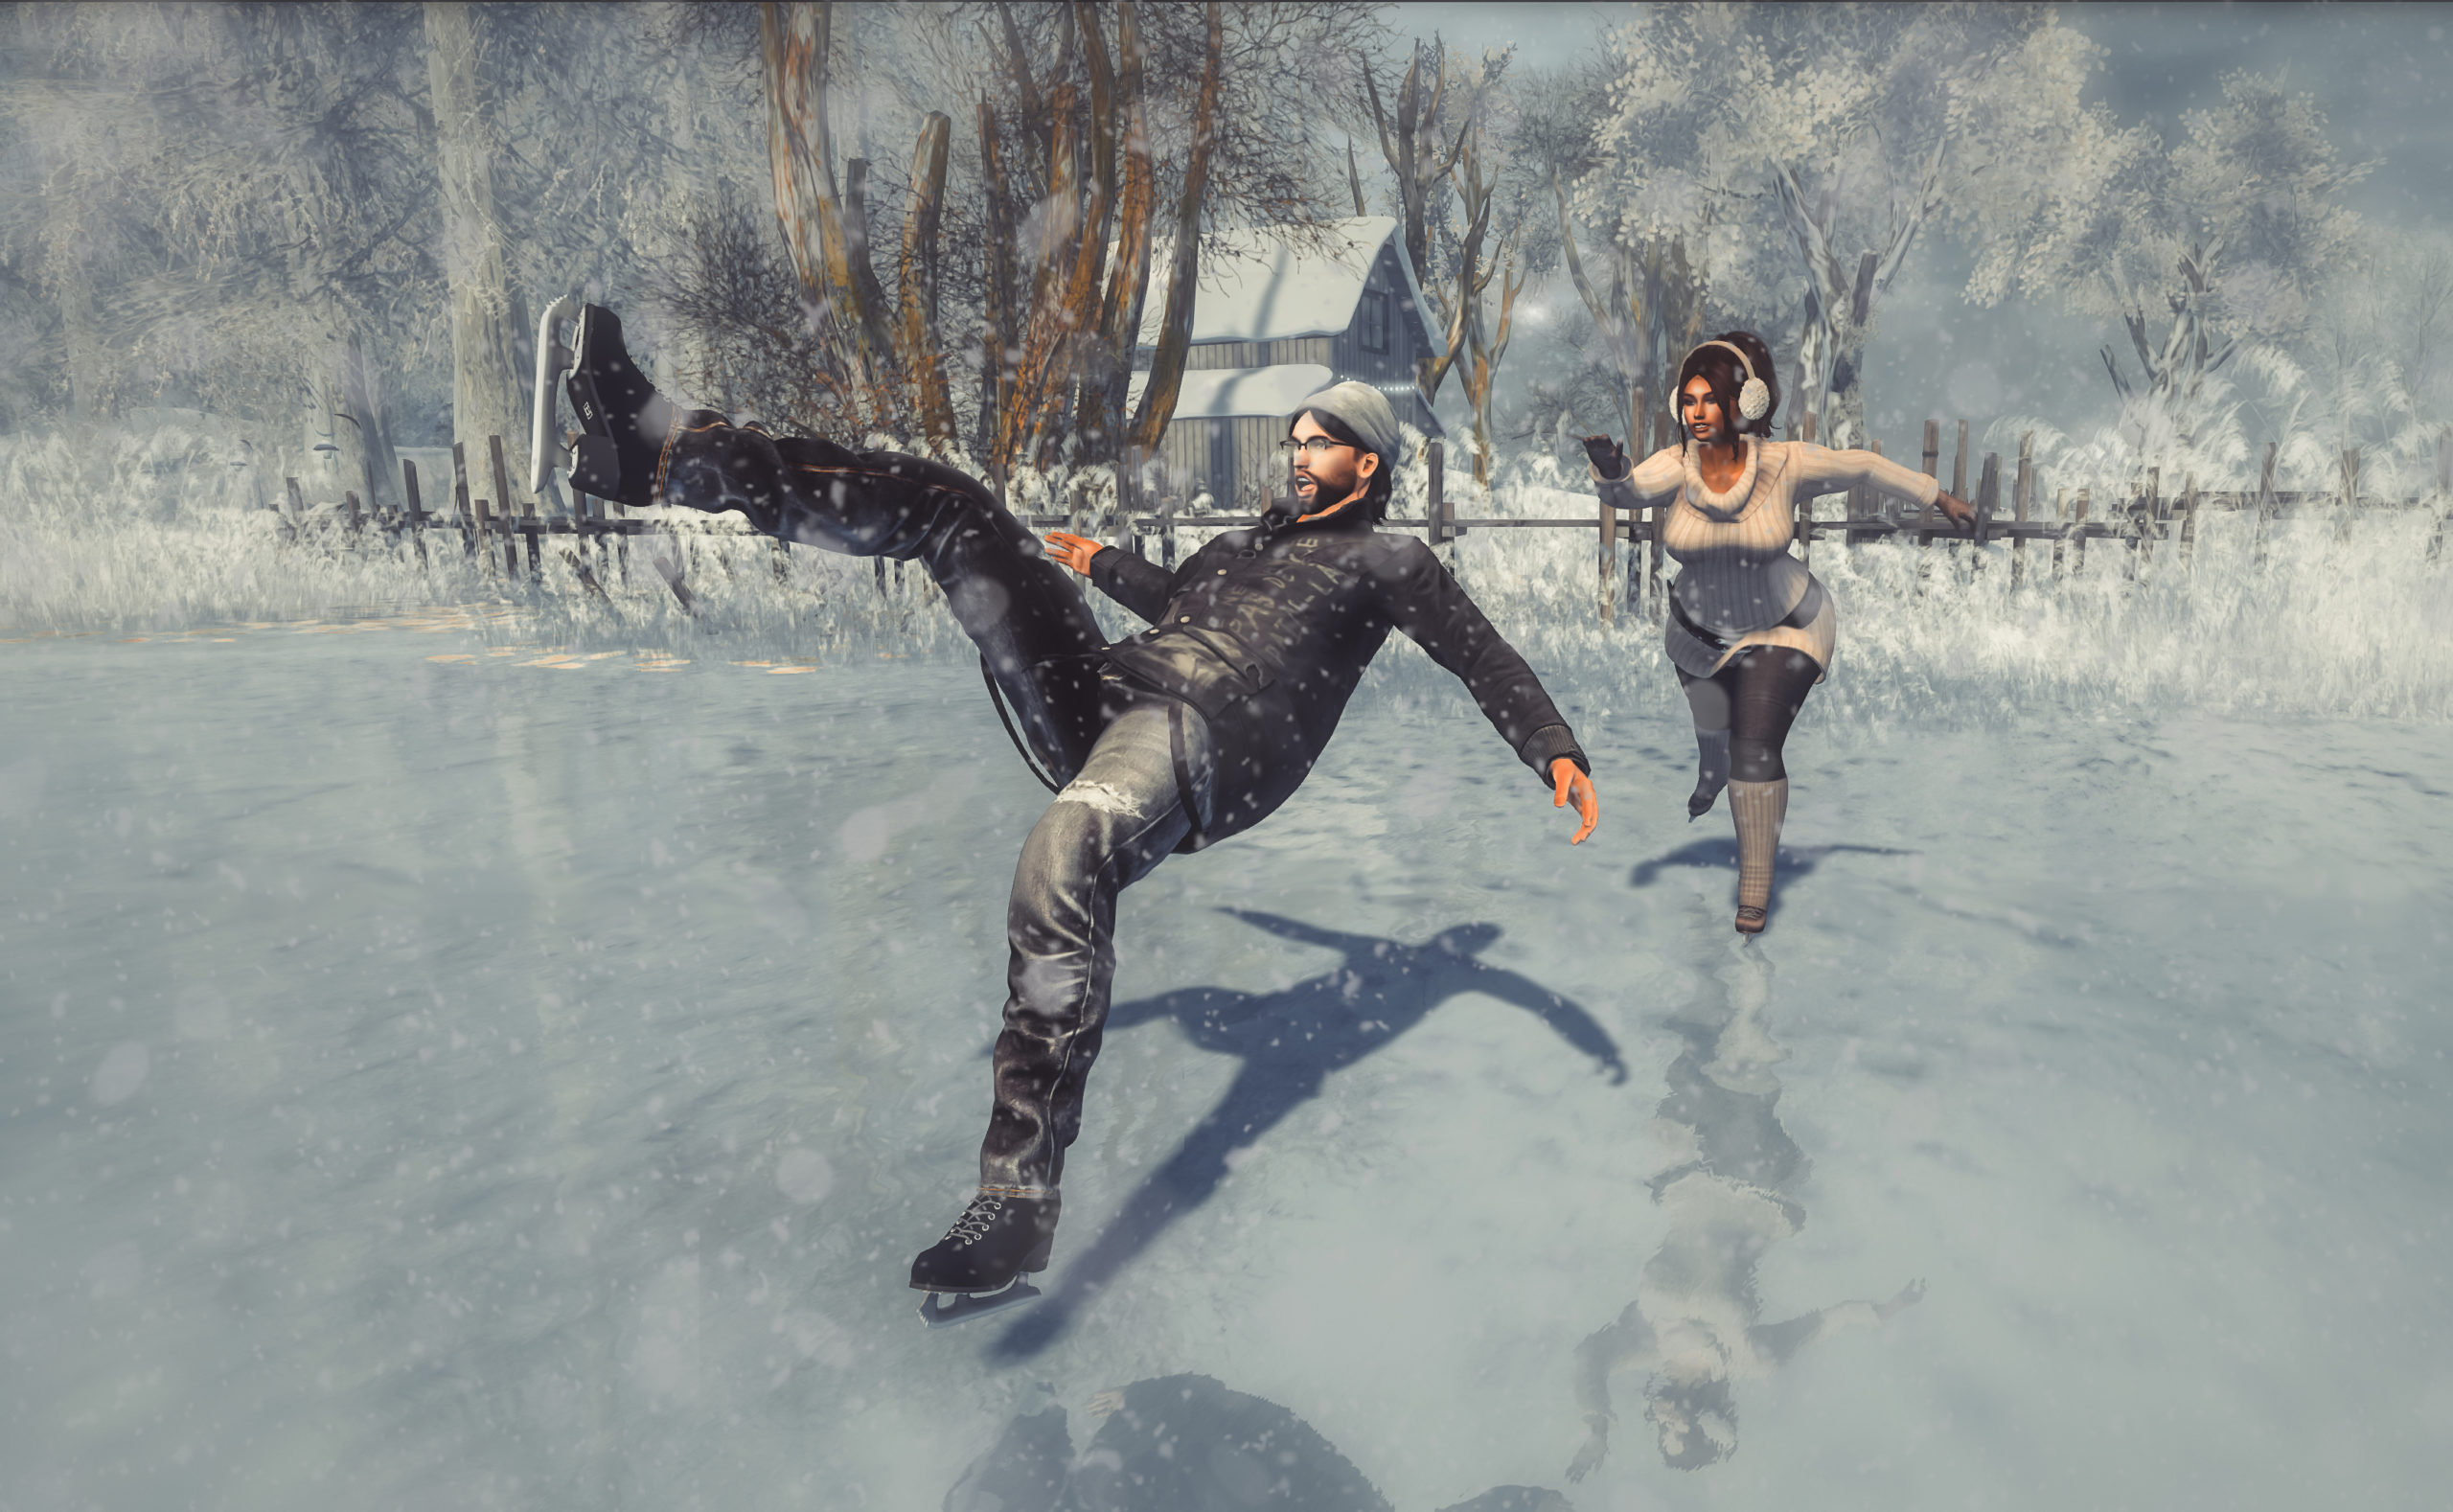 iceskating